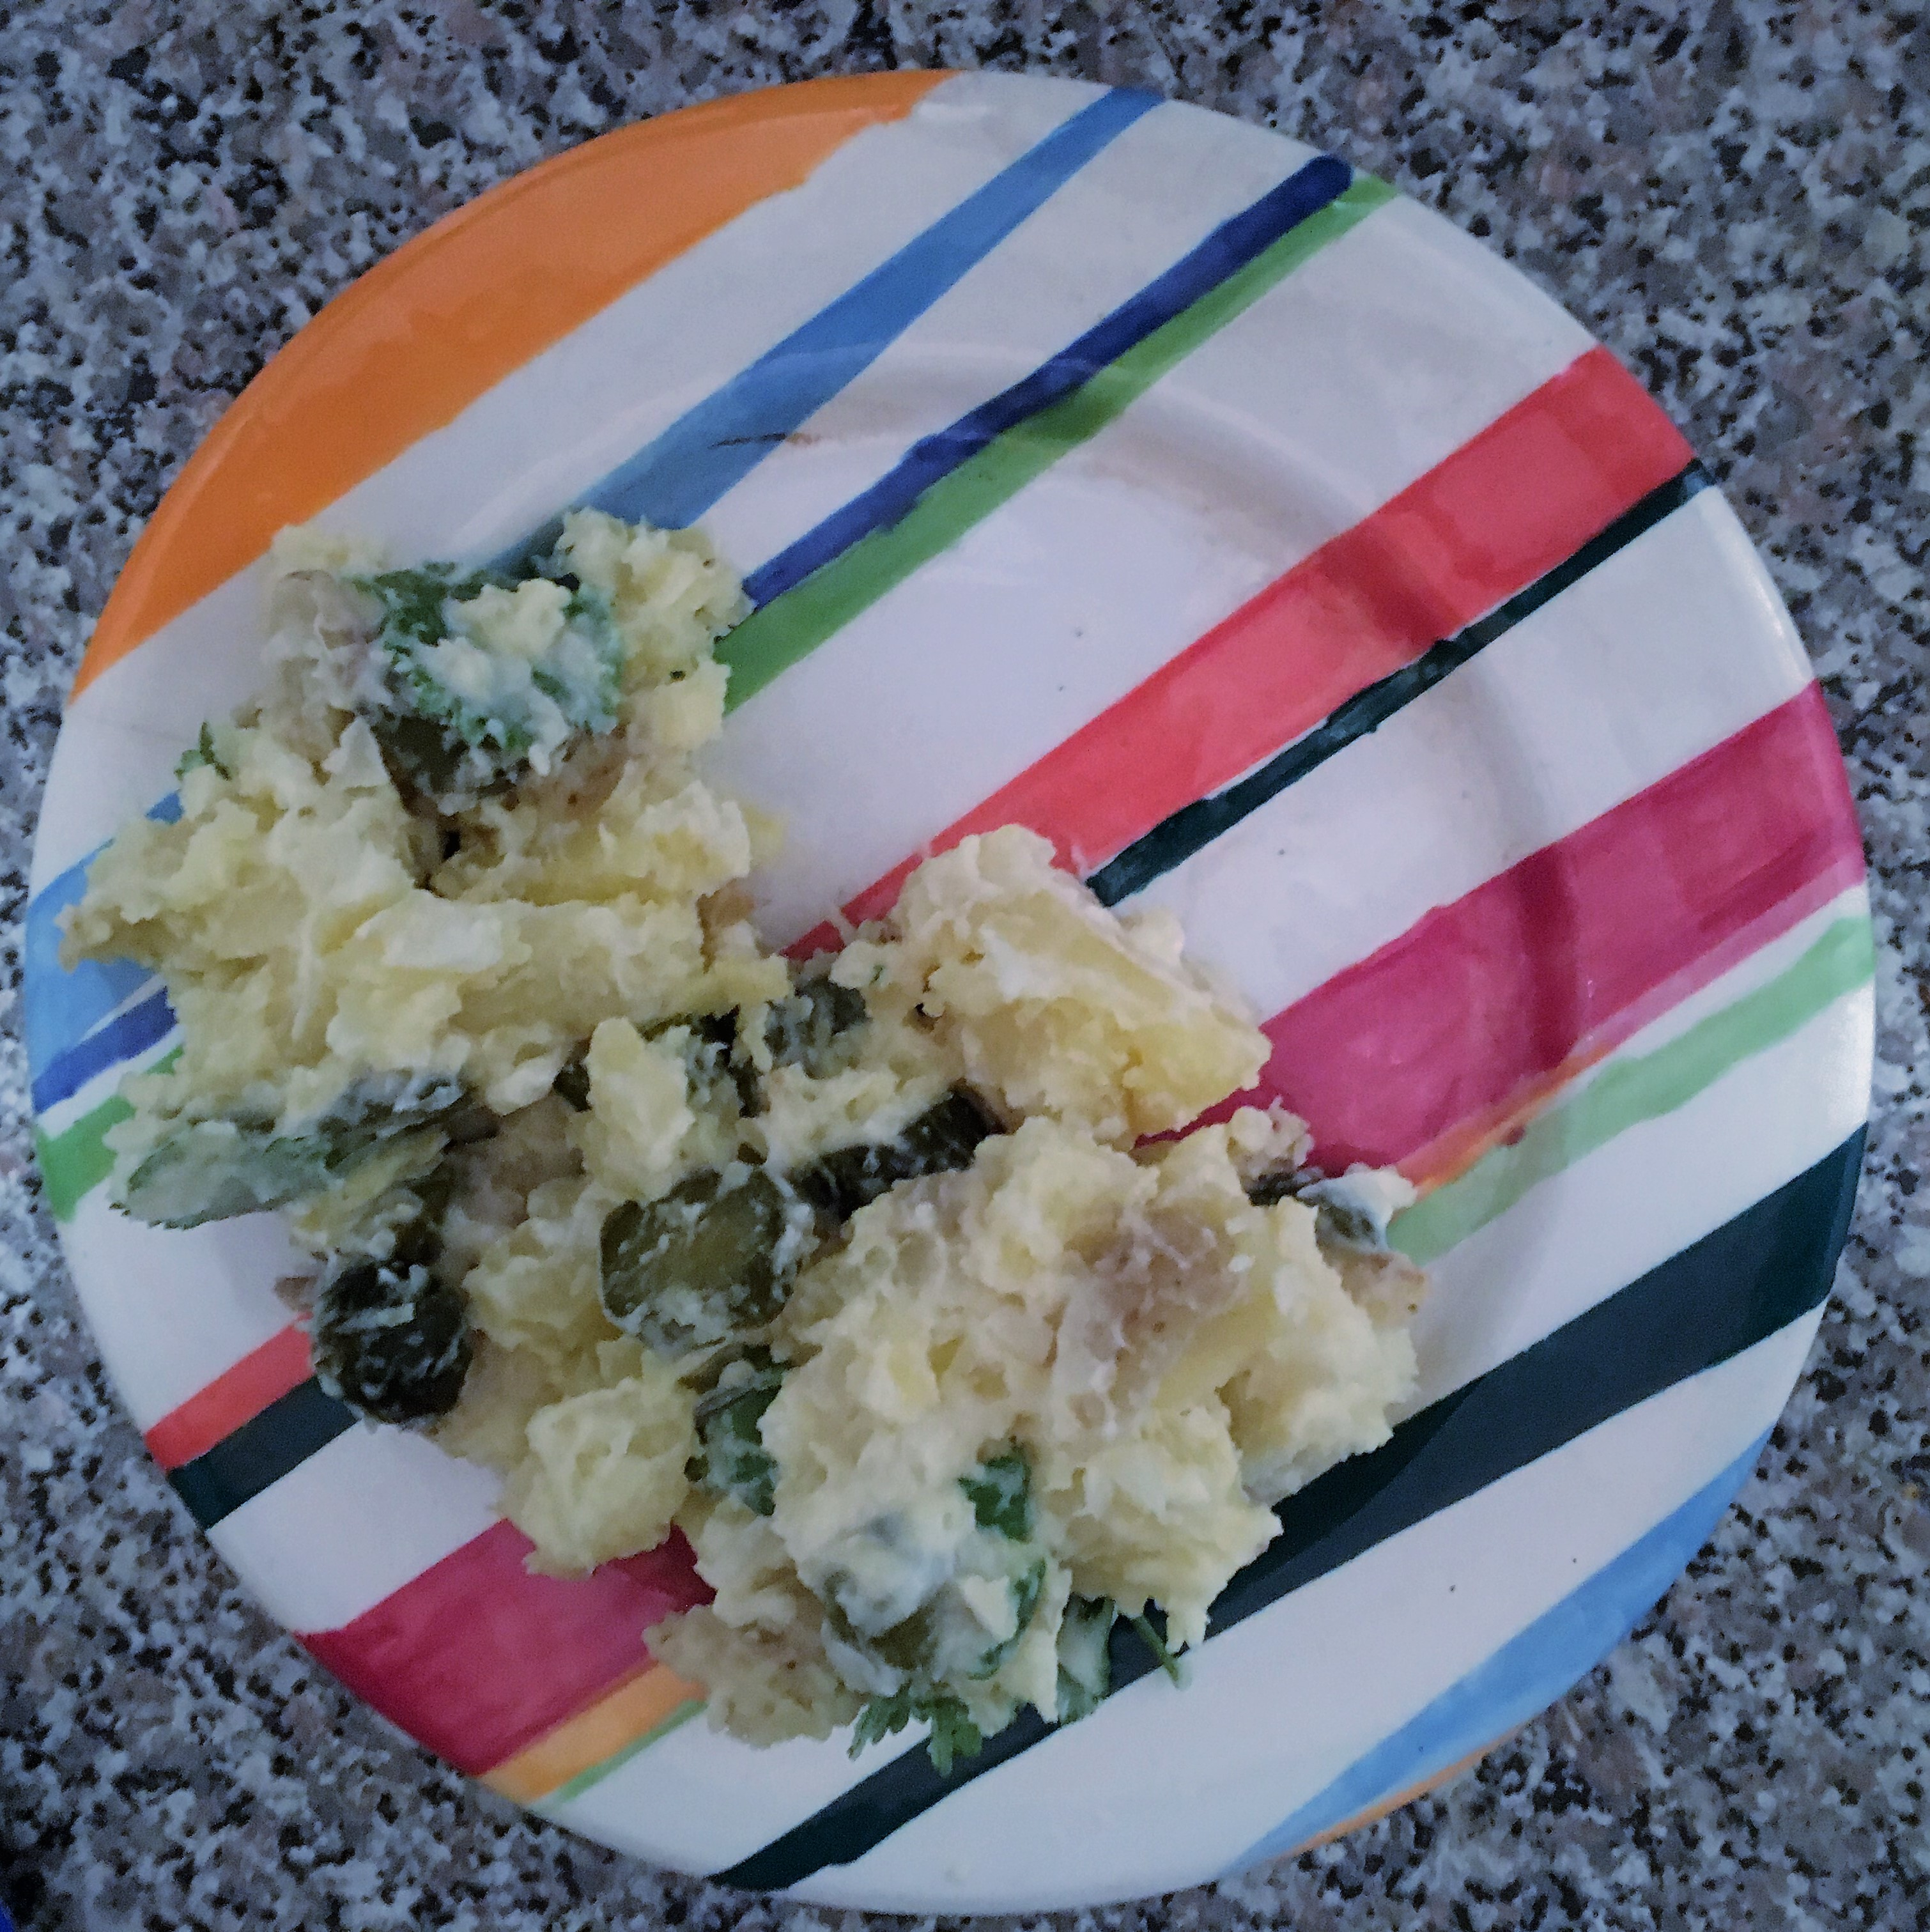 Potato salad on a colored plate